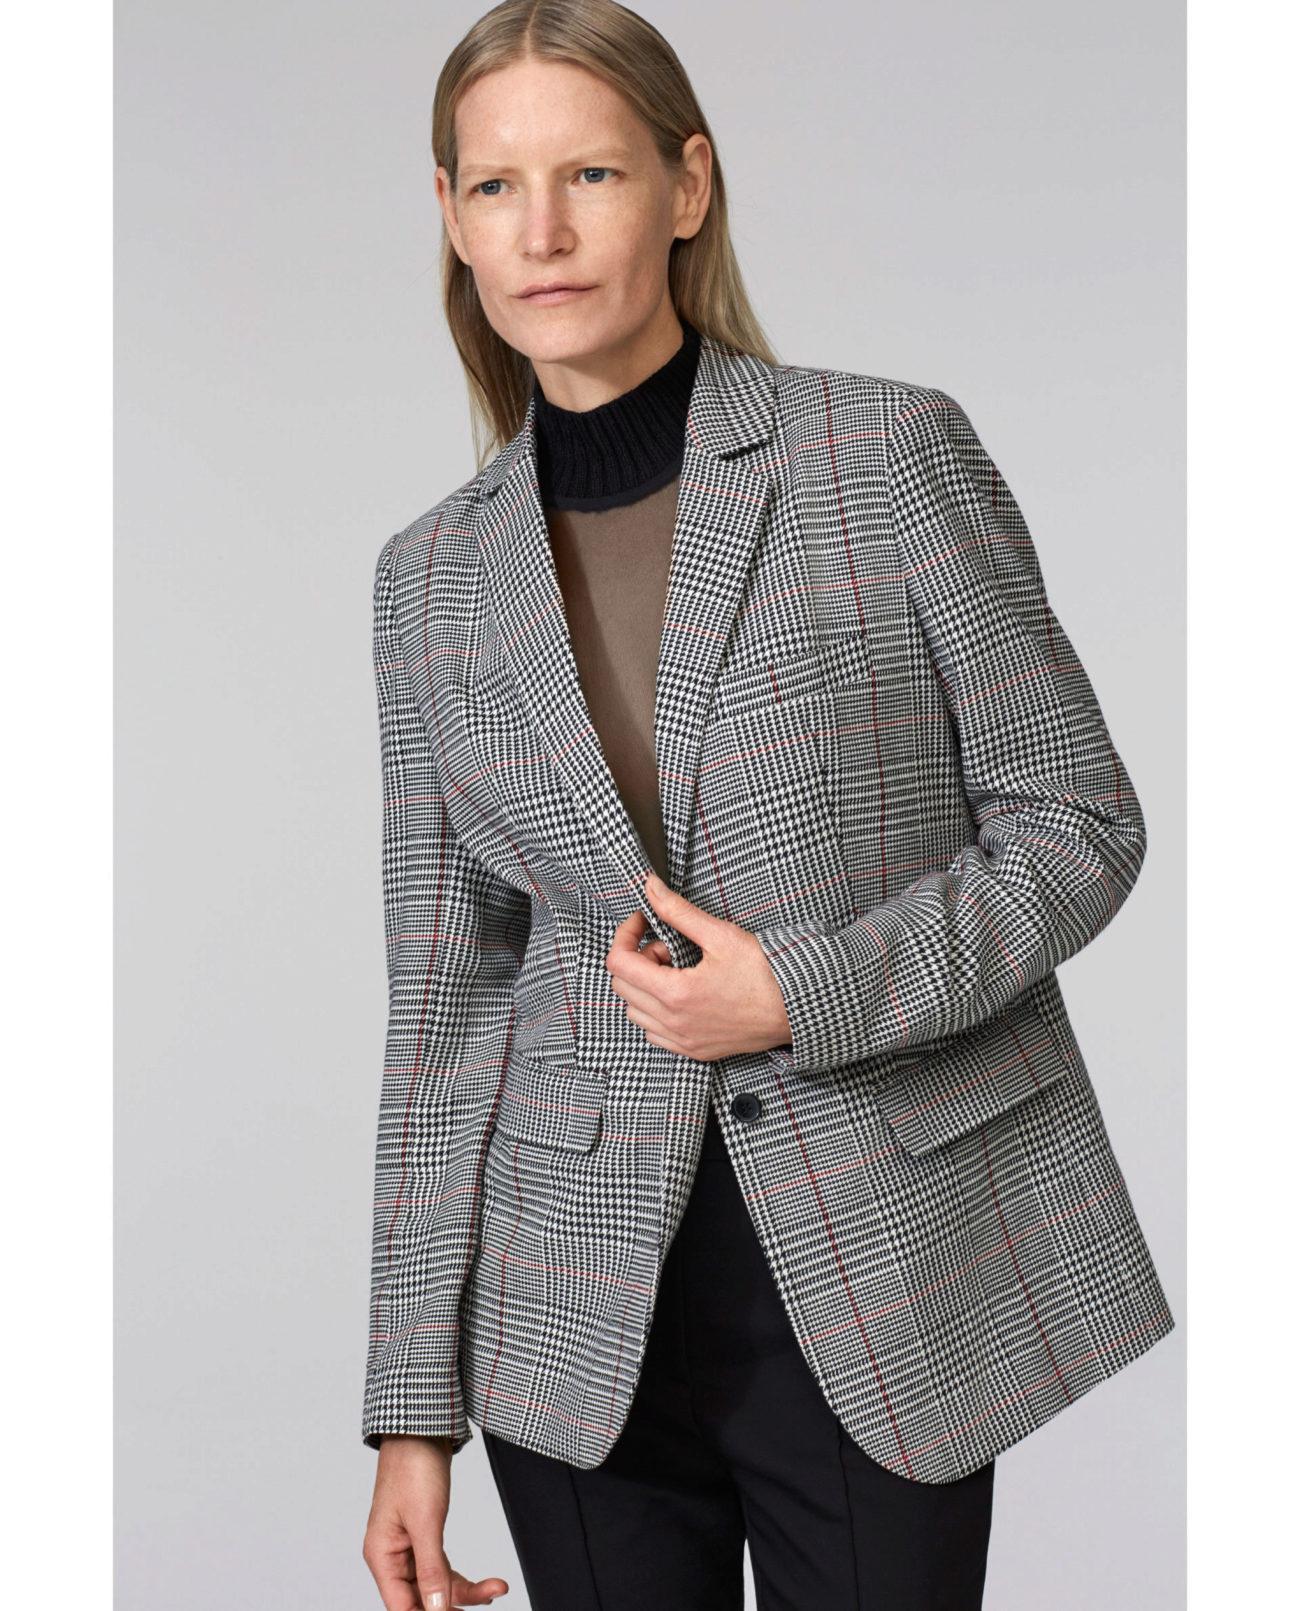 muchos estilos 100% Calidad profesional Blazer de cuadros, de Zara (39,95 euros) | Timeless II ...